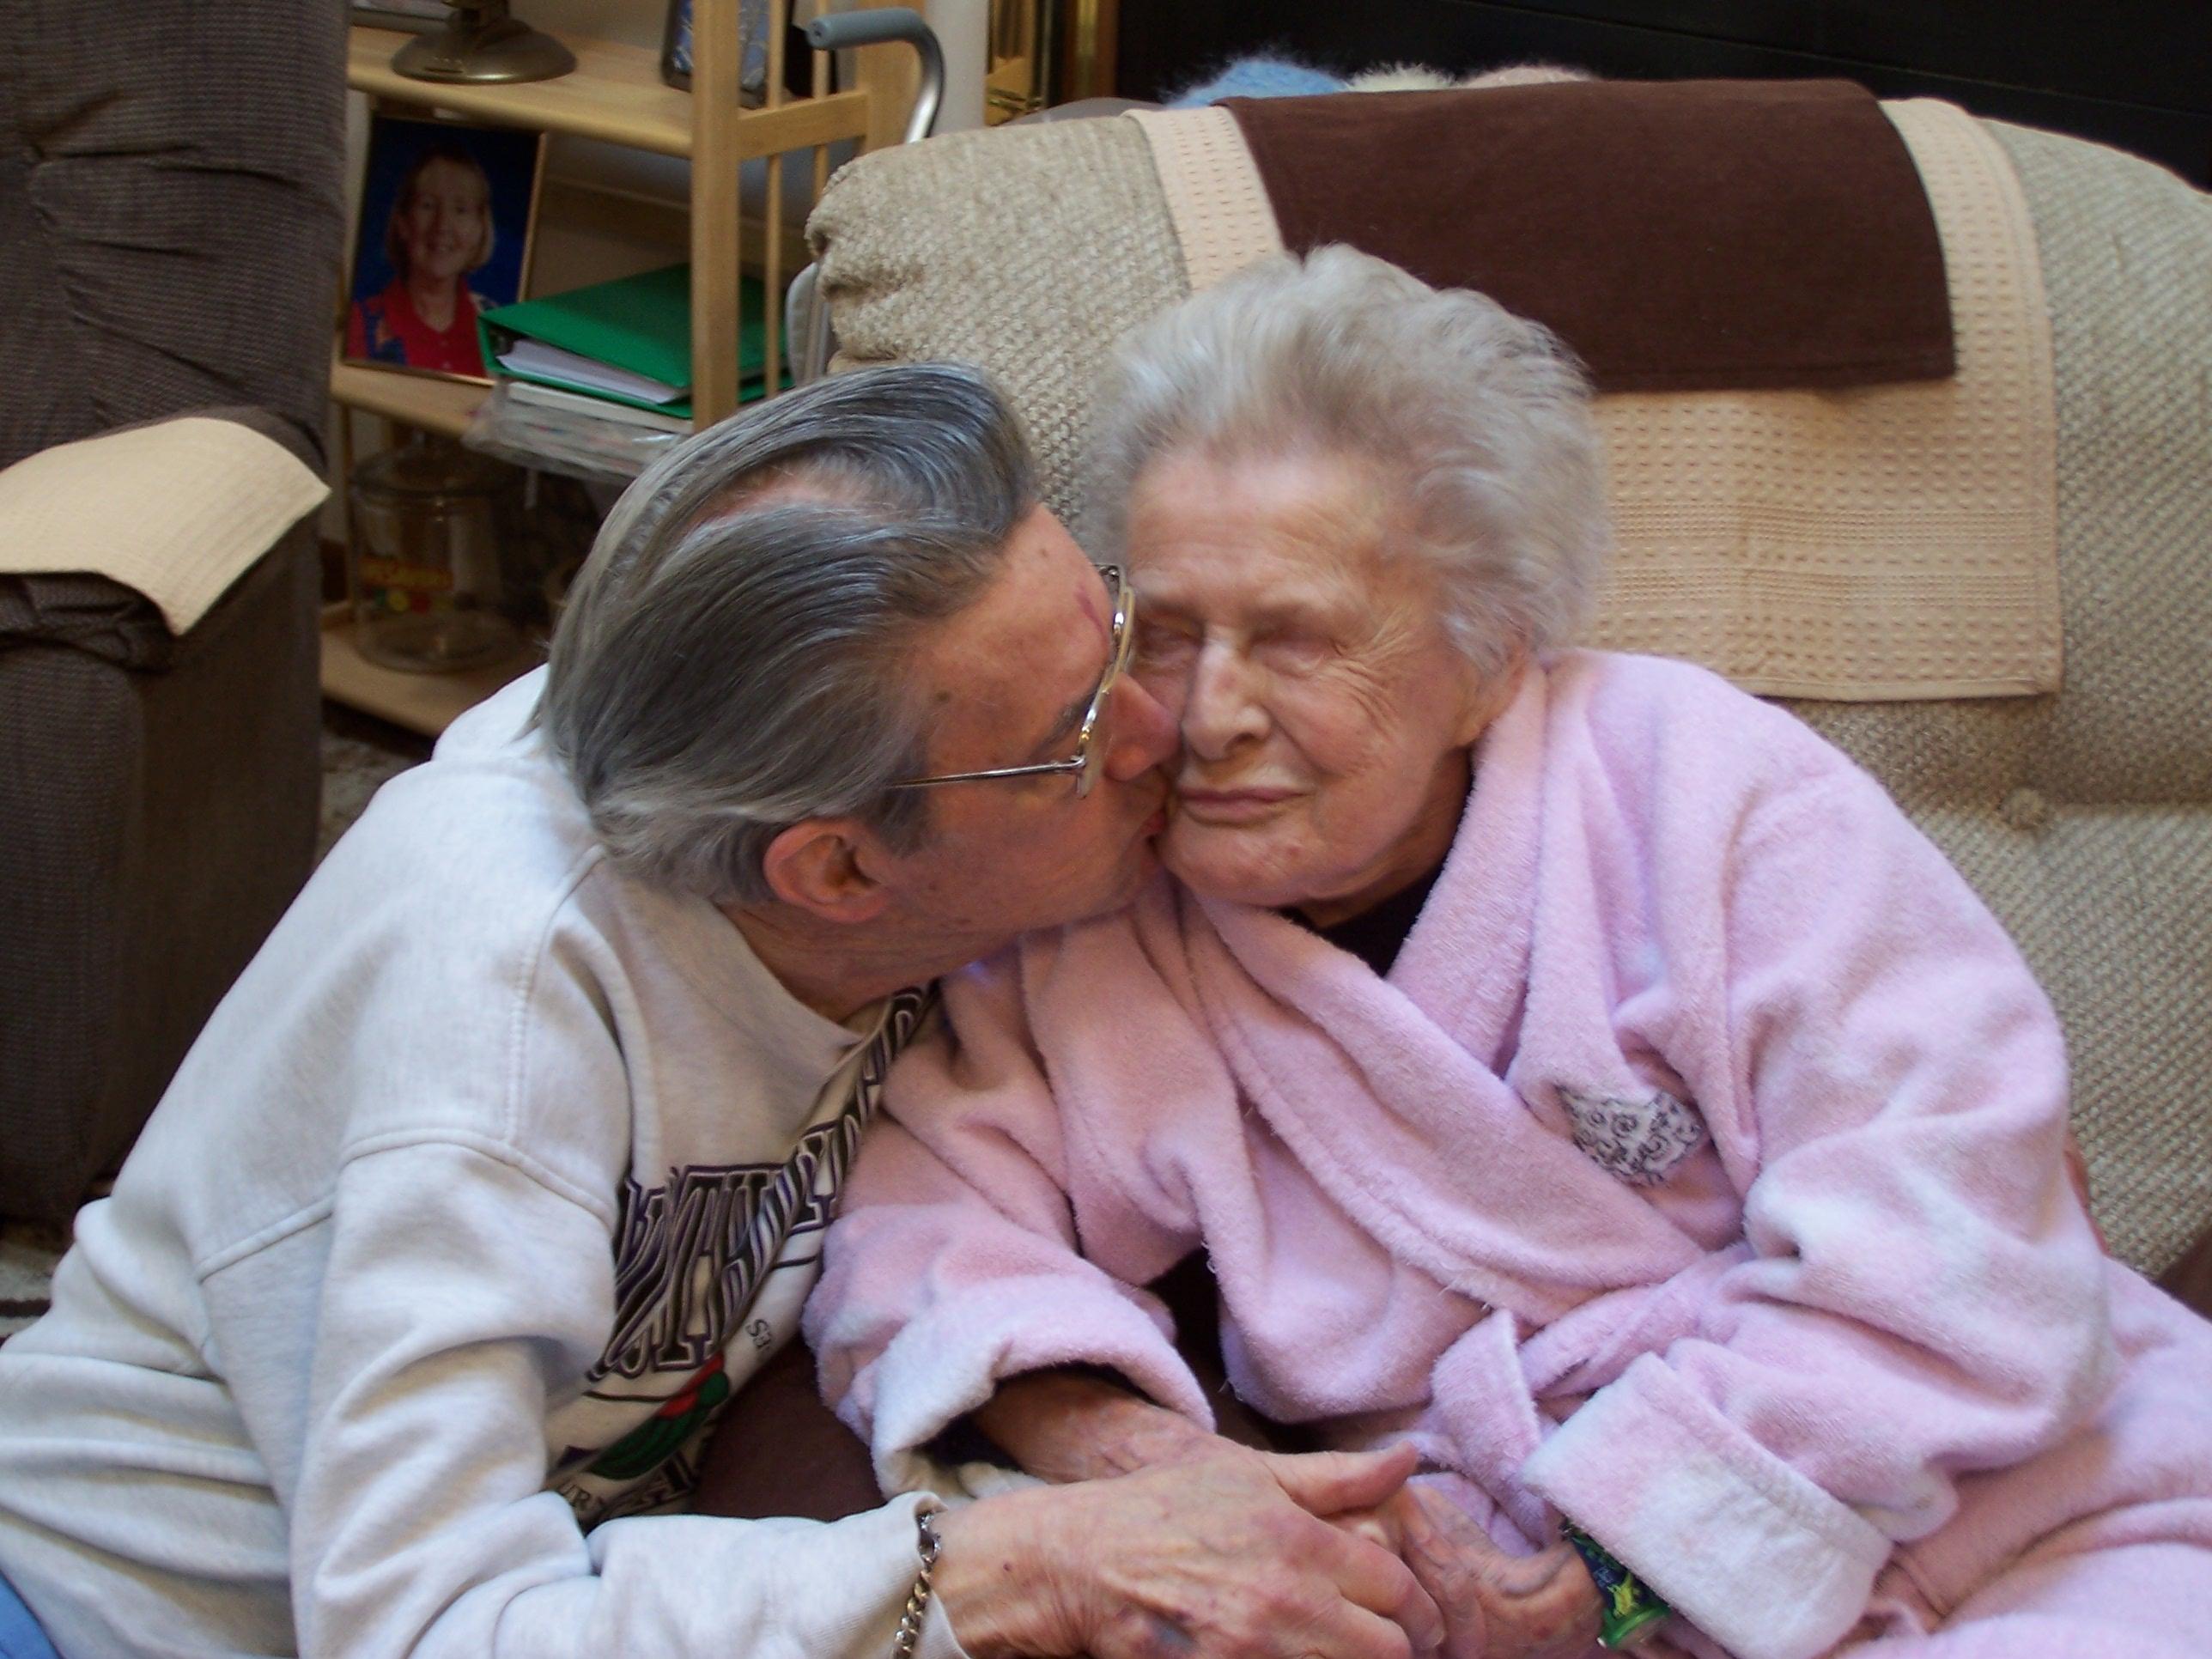 delaware hospice serves growing aging population